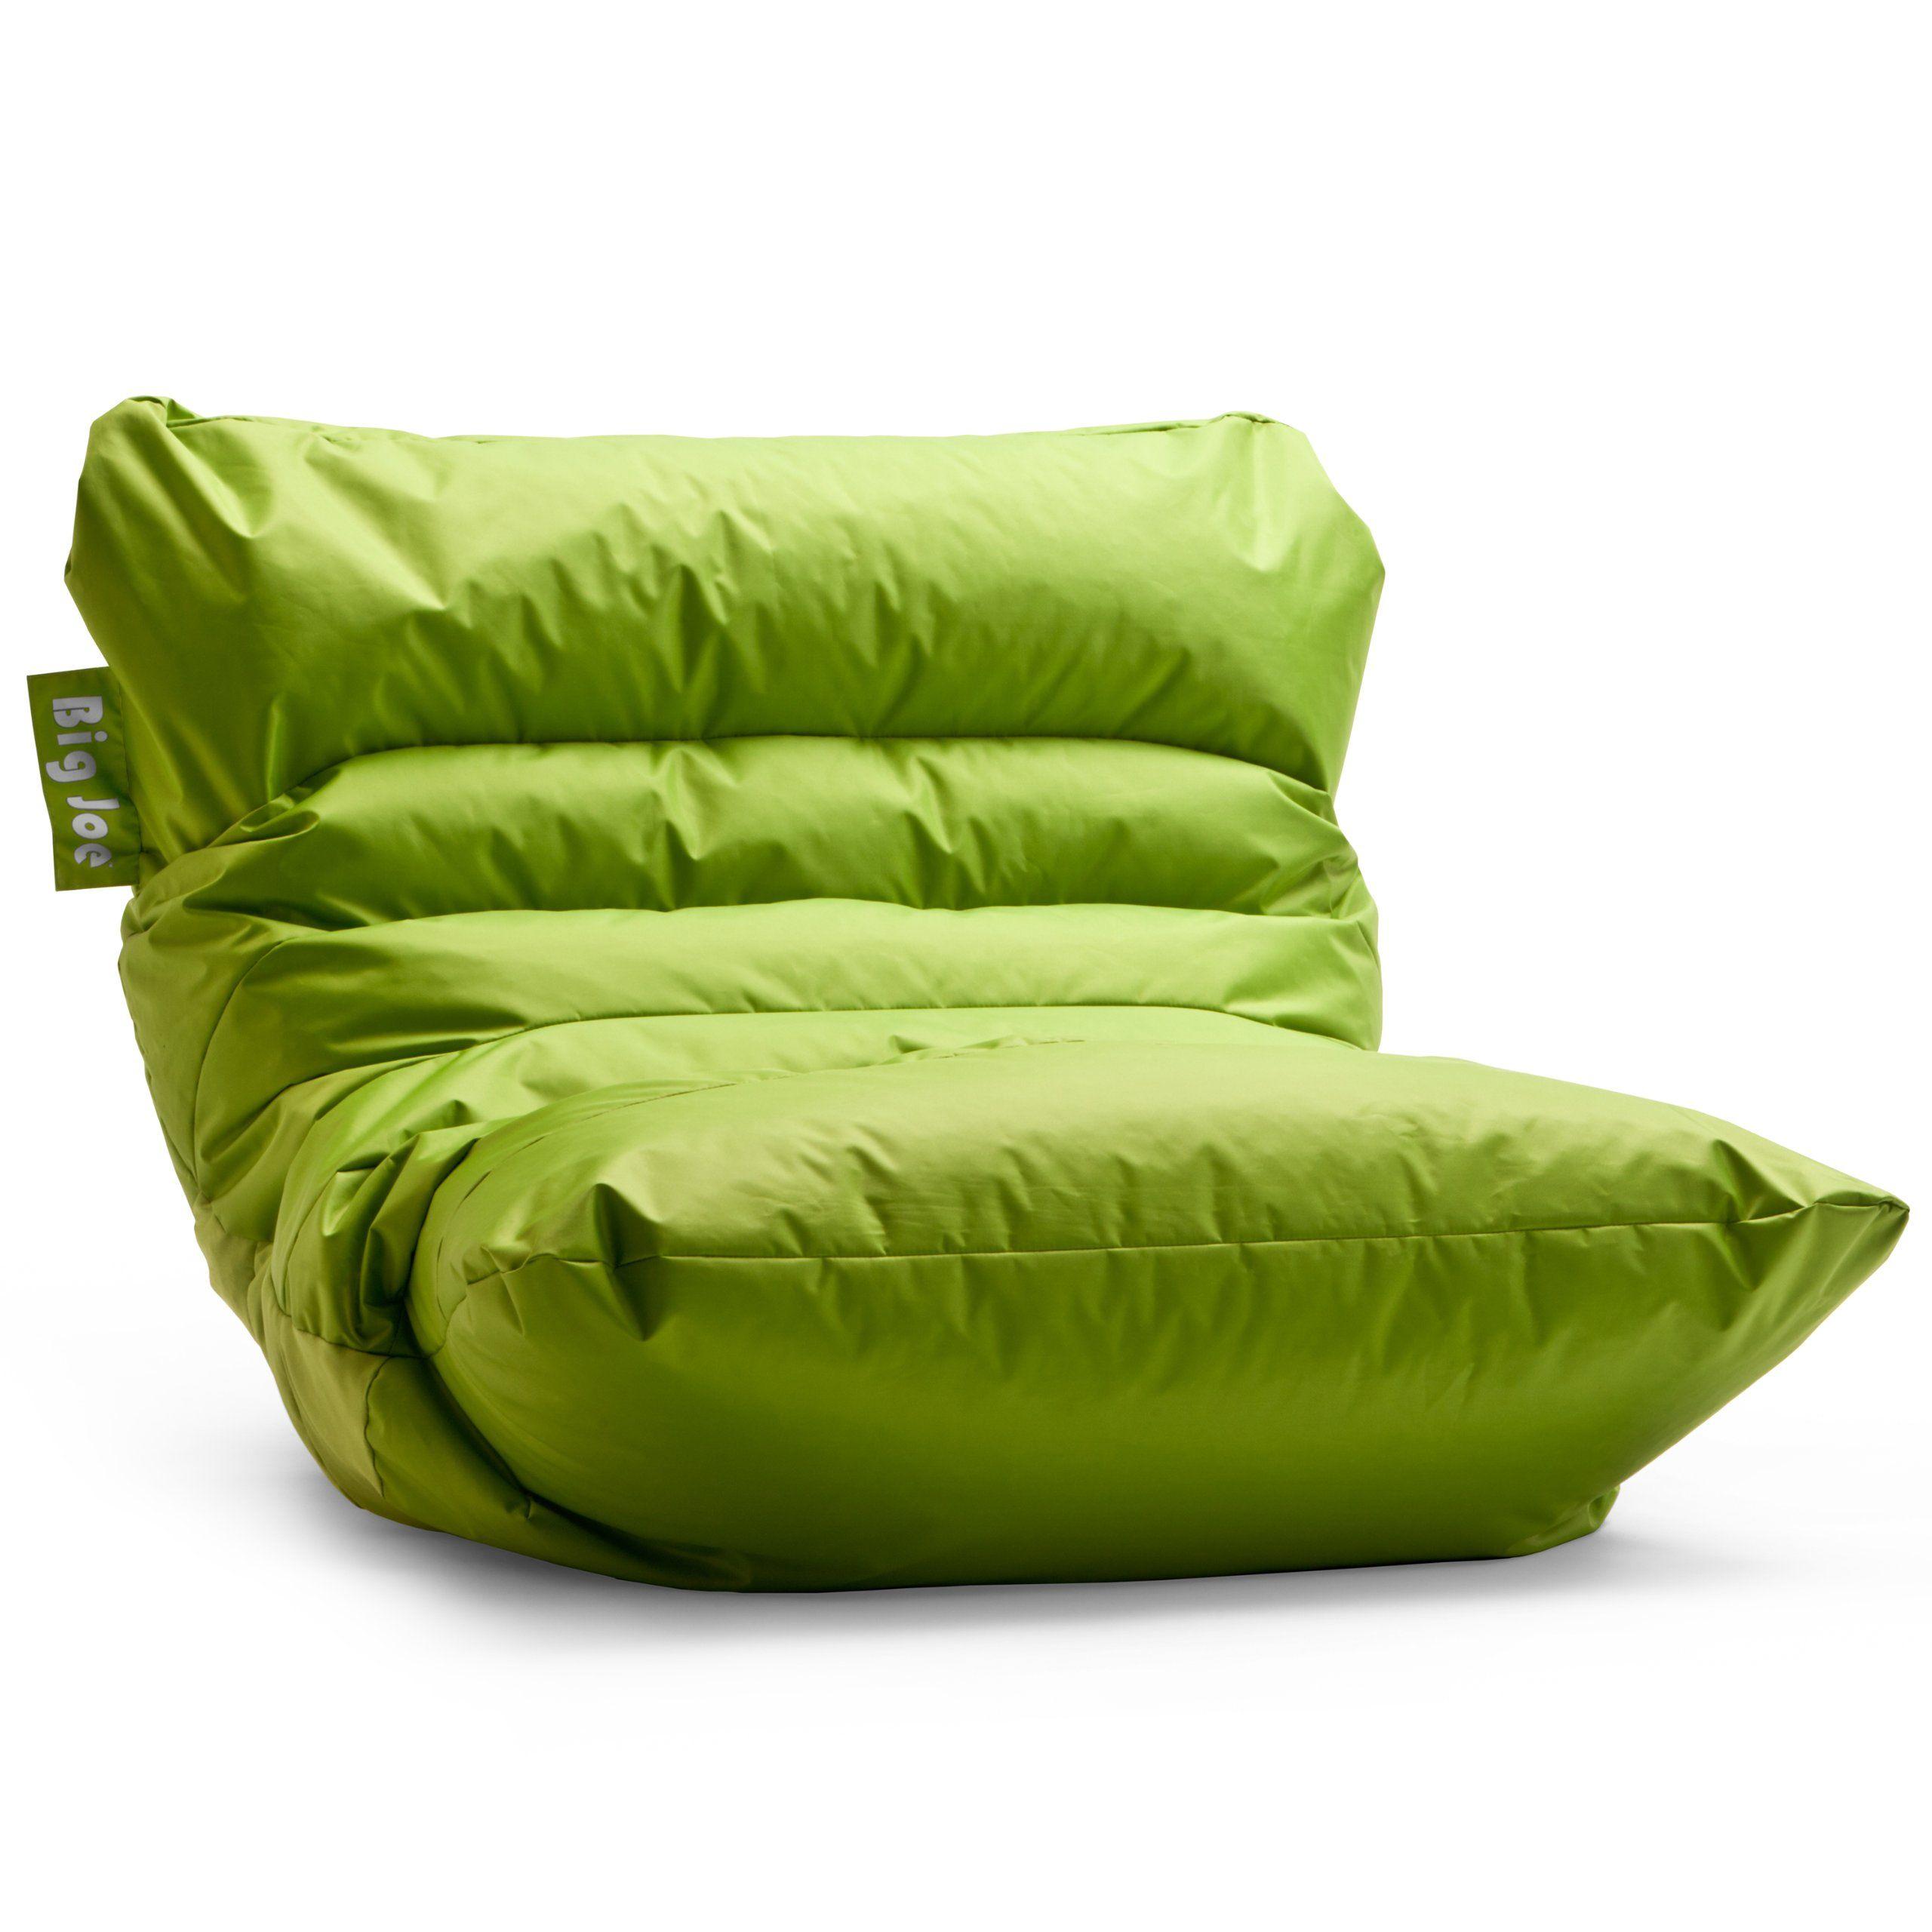 Amazon Com Big Joe Roma Bean Bag Chair Spicy Lime Beanbag Chairs For Teens Bean Bag Chair Big Bean Bag Chairs Big Bean Bags